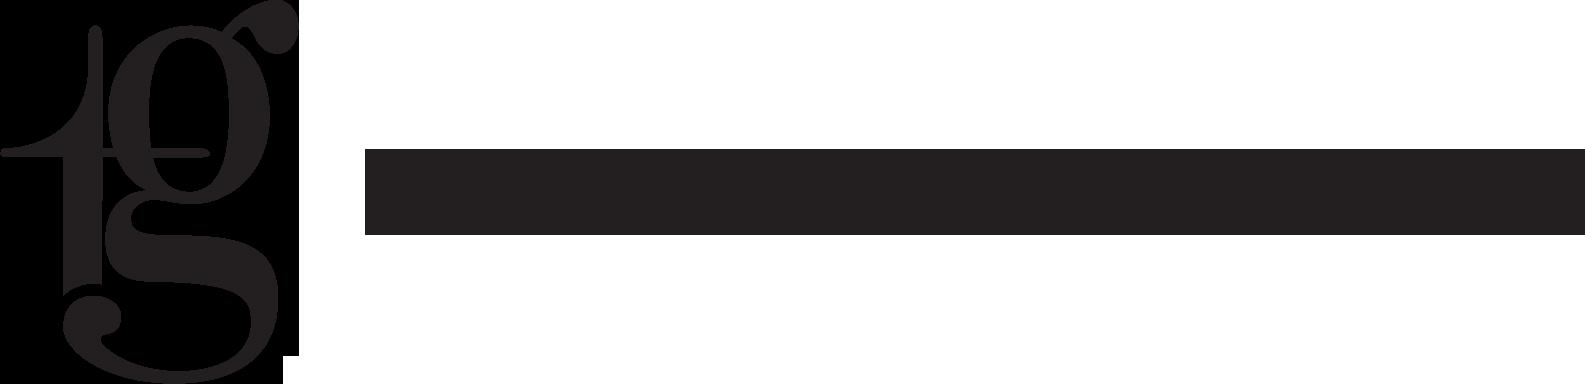 3 – Trigraff